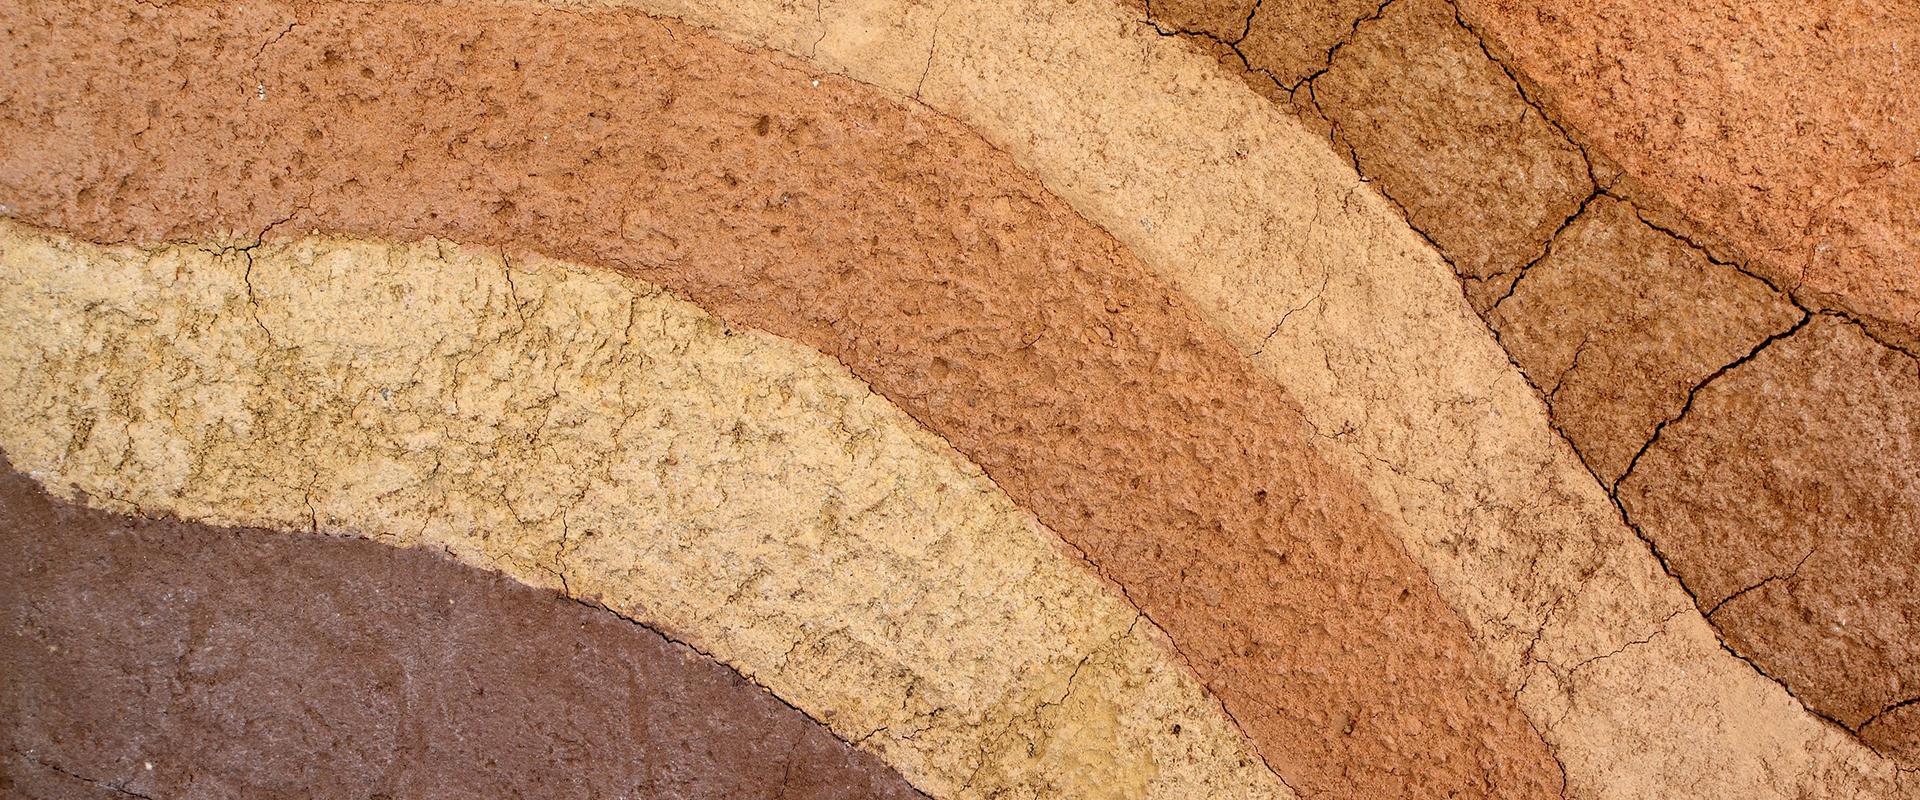 12567845 - layer of soil underground